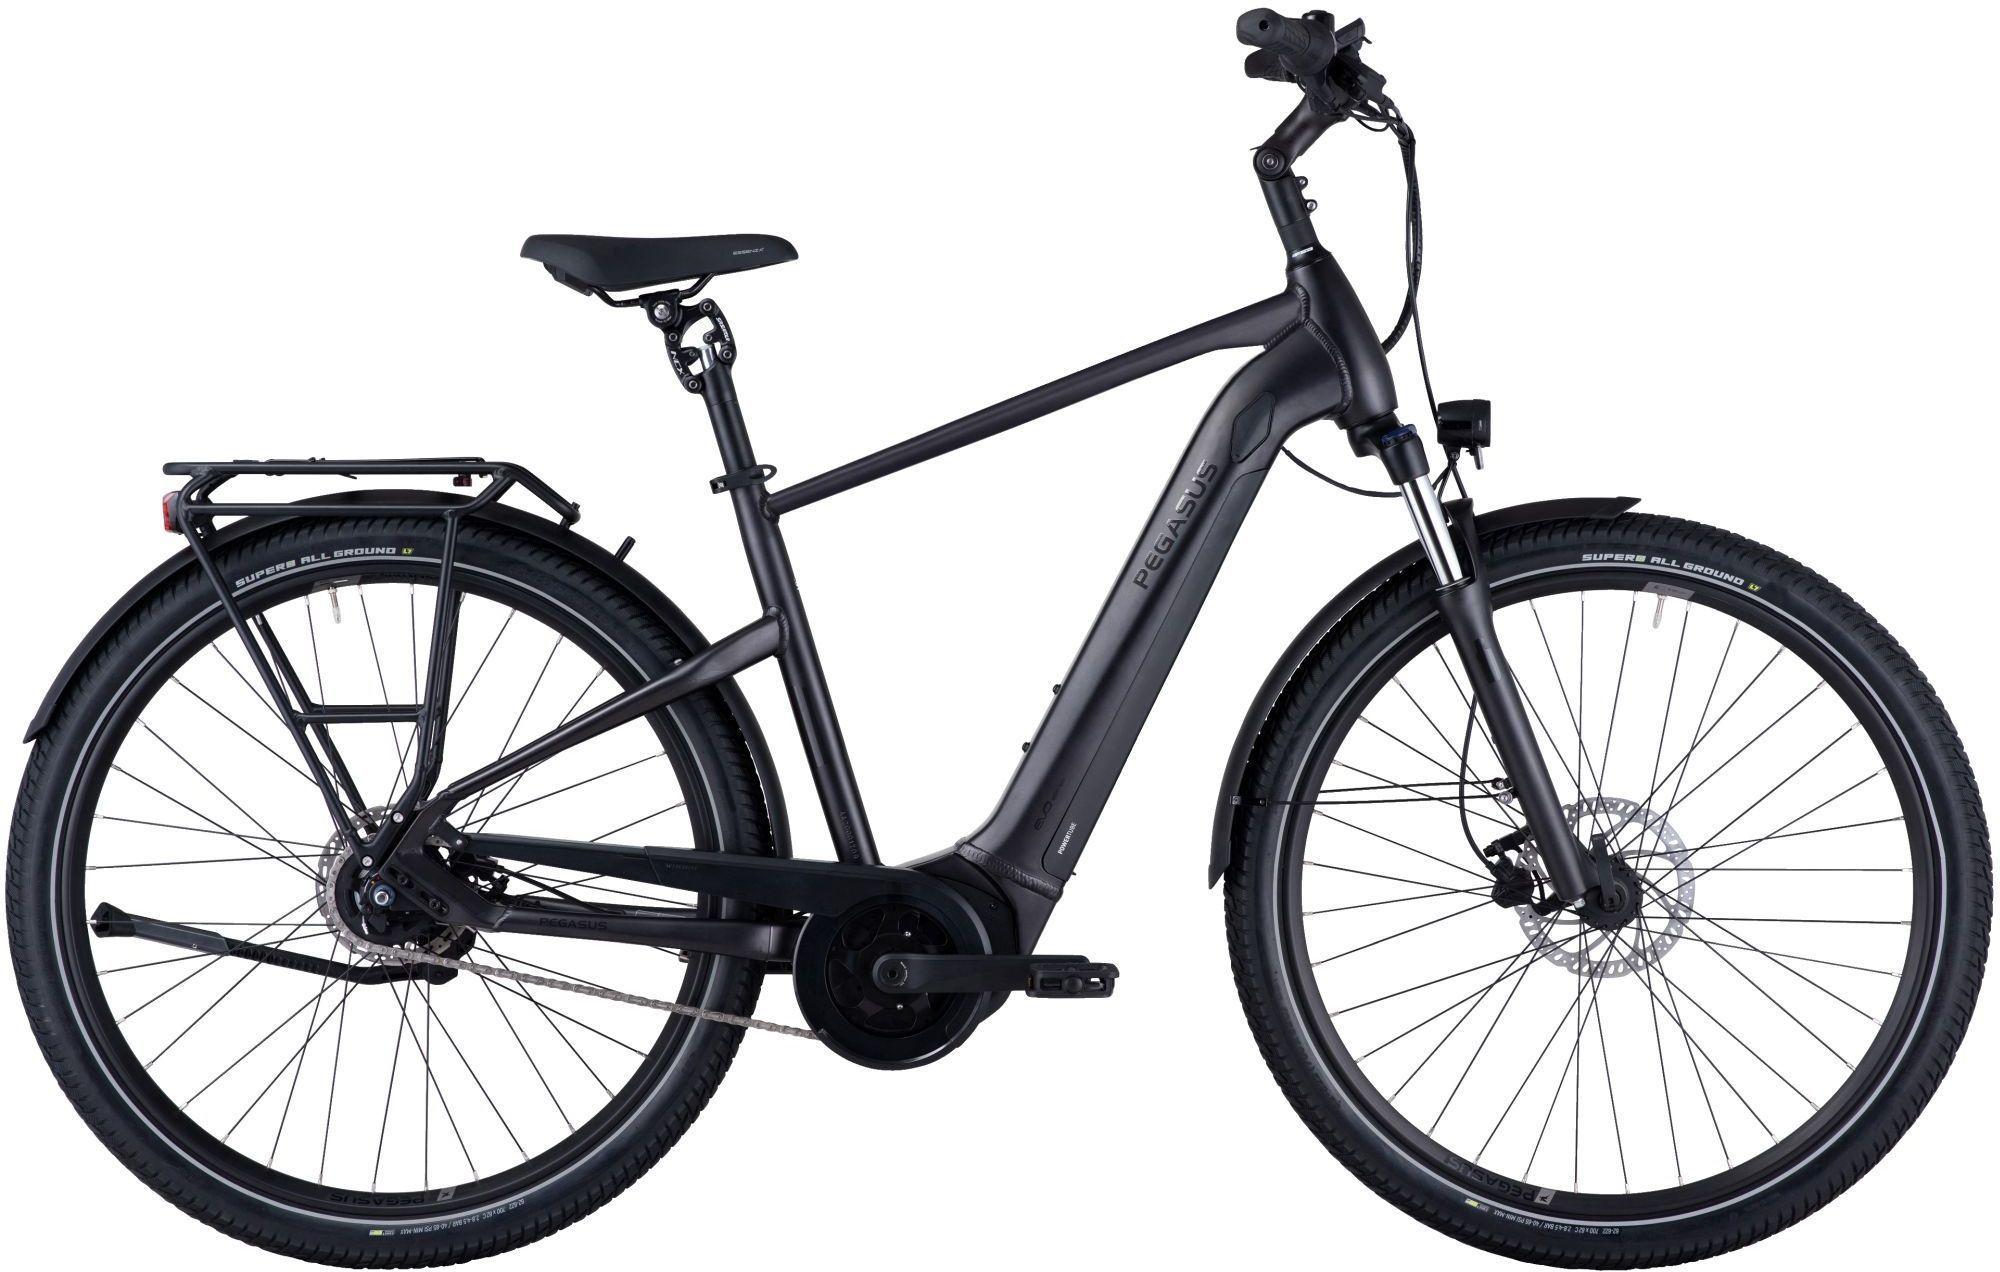 E-Bikes/Citybikes: Diamant  Savino EVO 5R Performance (400 Wh) 5 Gang Nabenschaltung Herrenfahrrad Diamant Modell 2021 28 Zoll 40 cm shimano gr